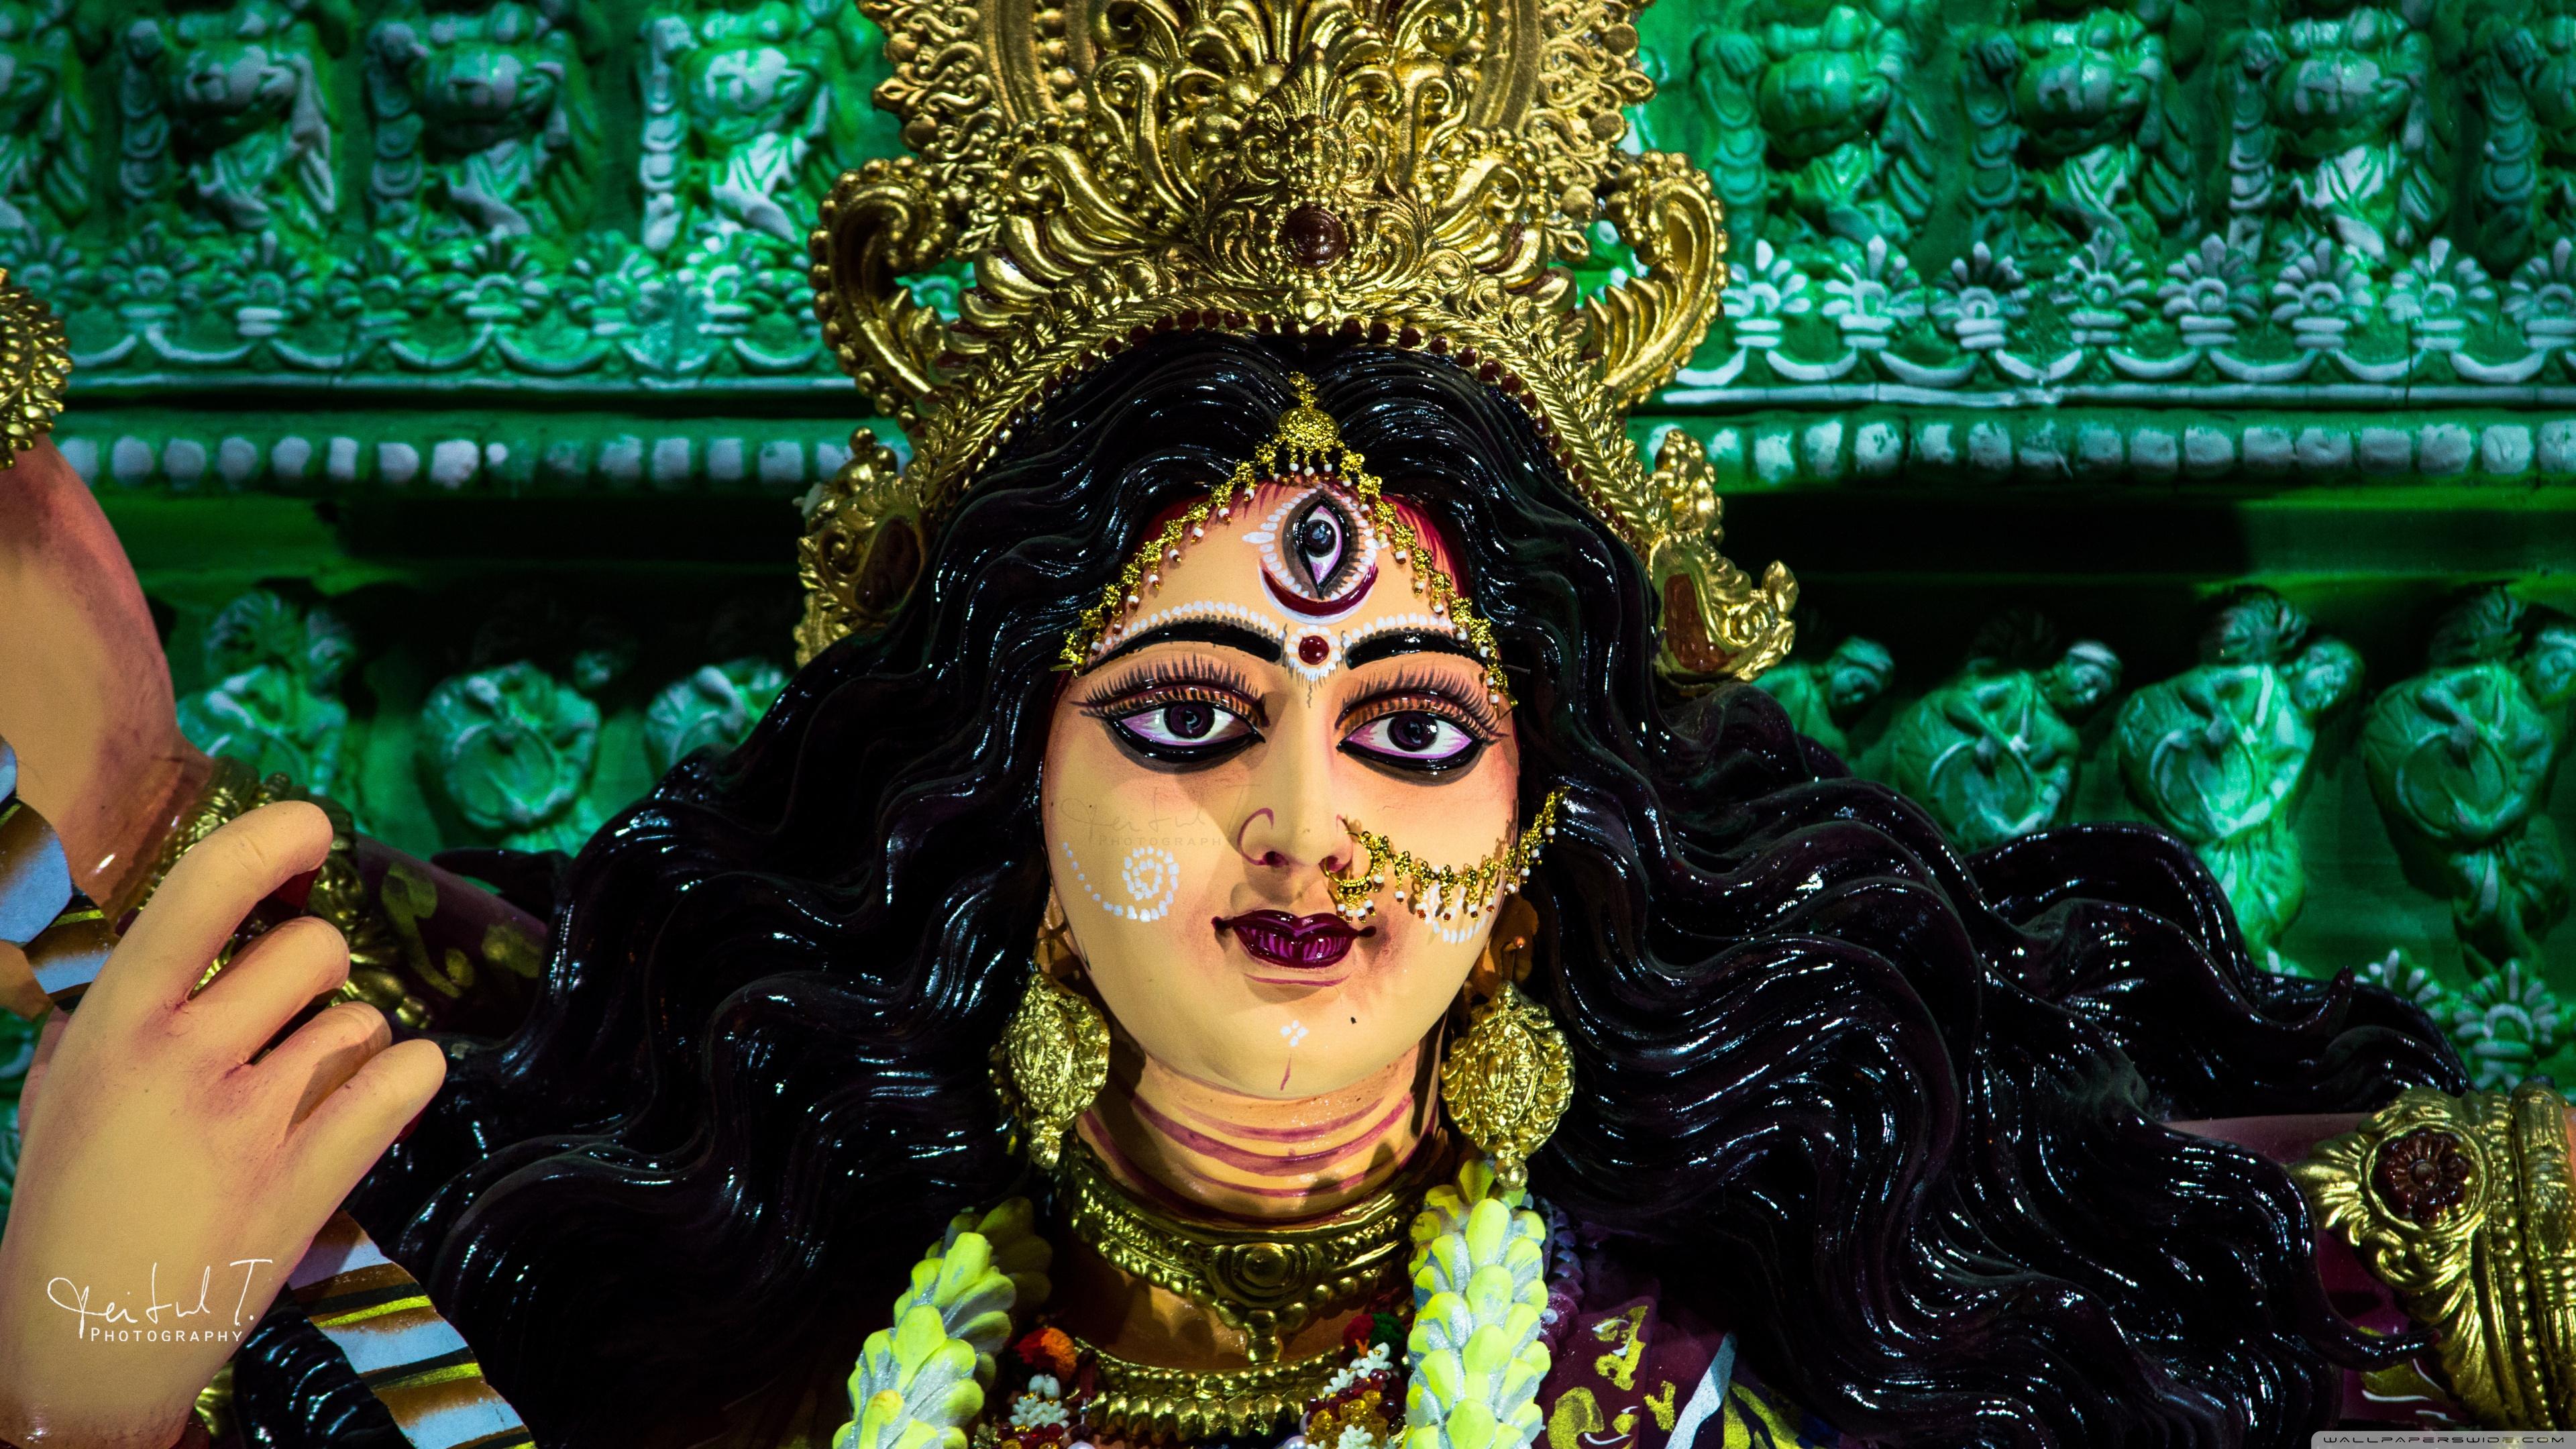 Durga Maa Image 4k 3840x2160 Wallpaper Teahub Io